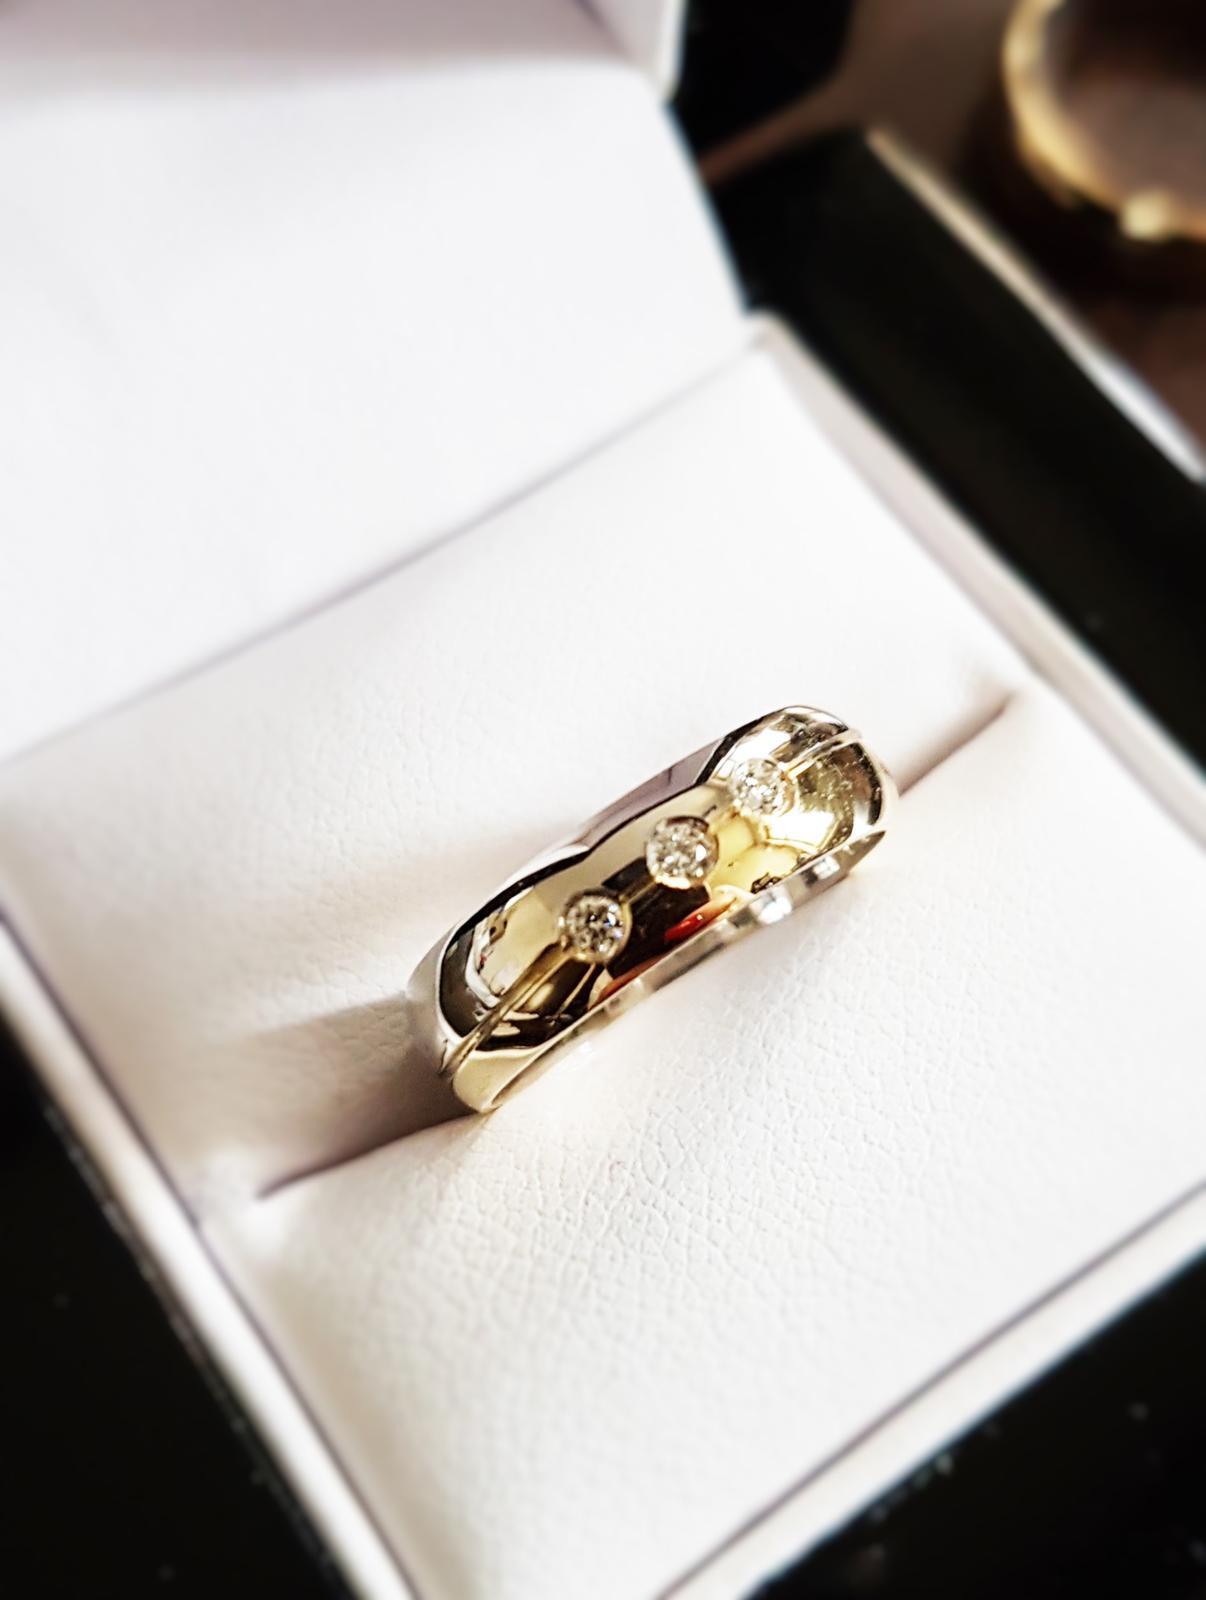 Masivni Snubni Prsteny Benet 830 S Brilianty 21 000 Kc Svatebni